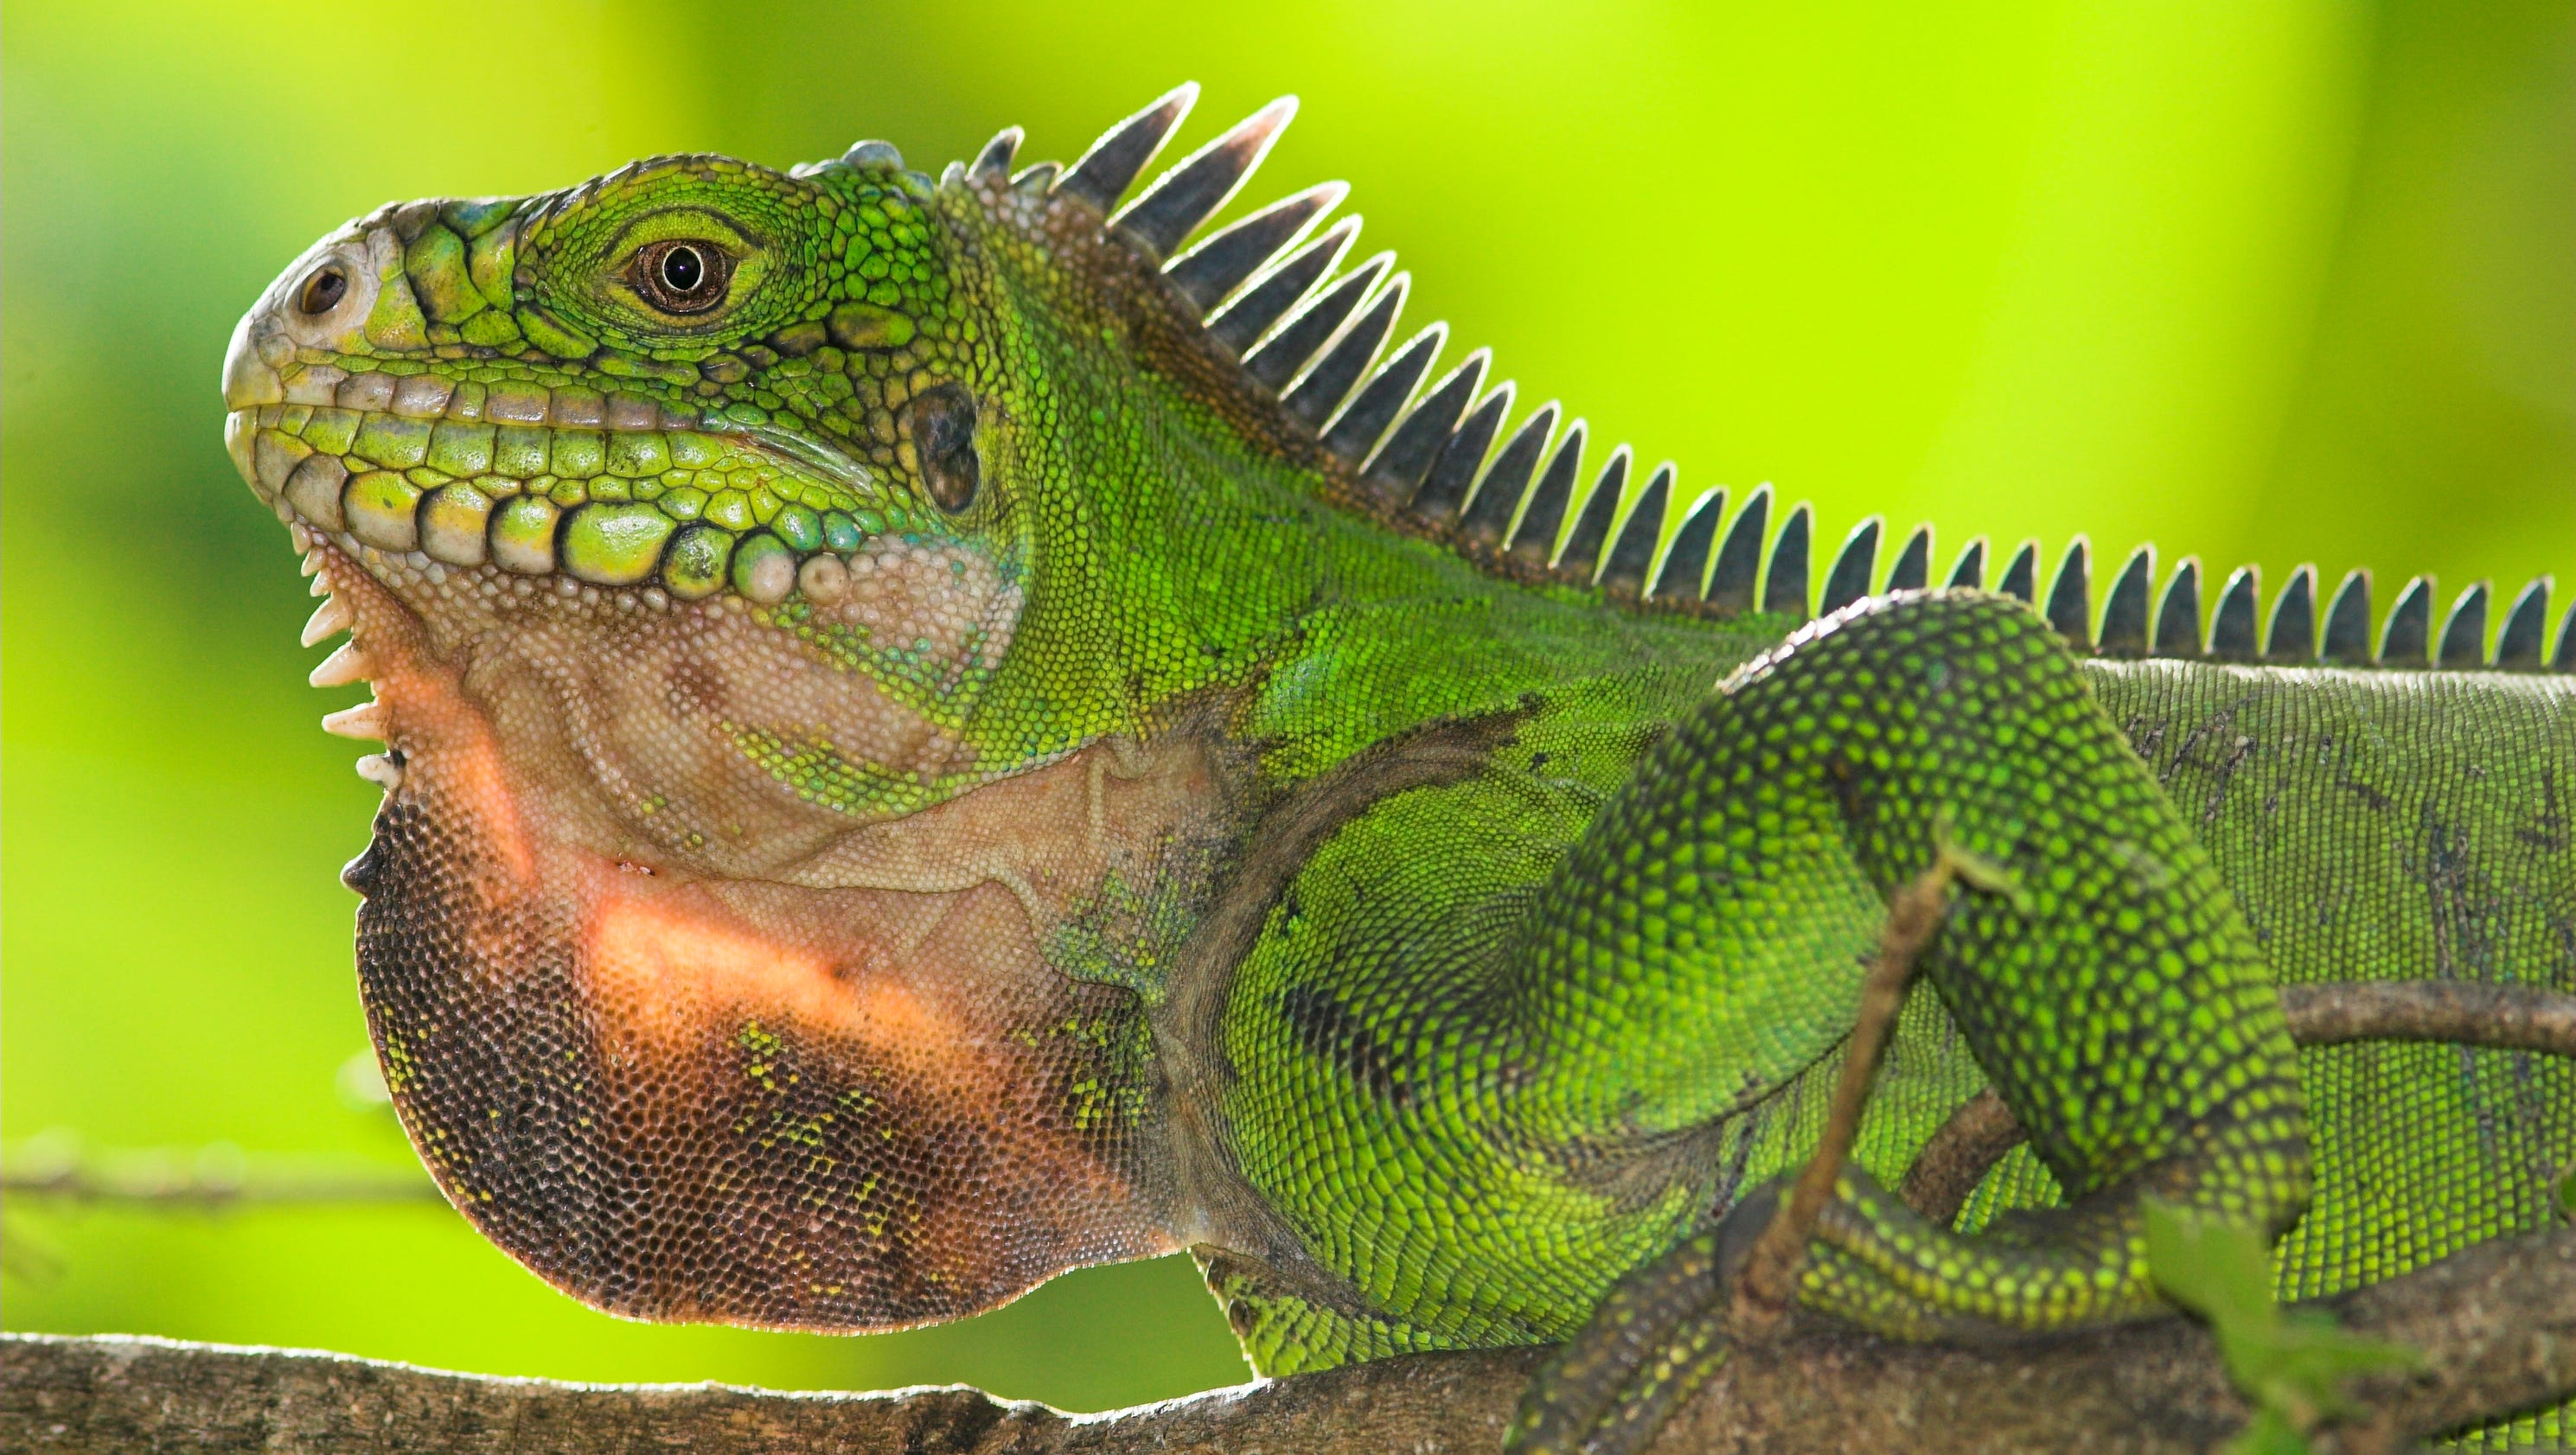 The lizard brain endangers democracy | Ben Carter